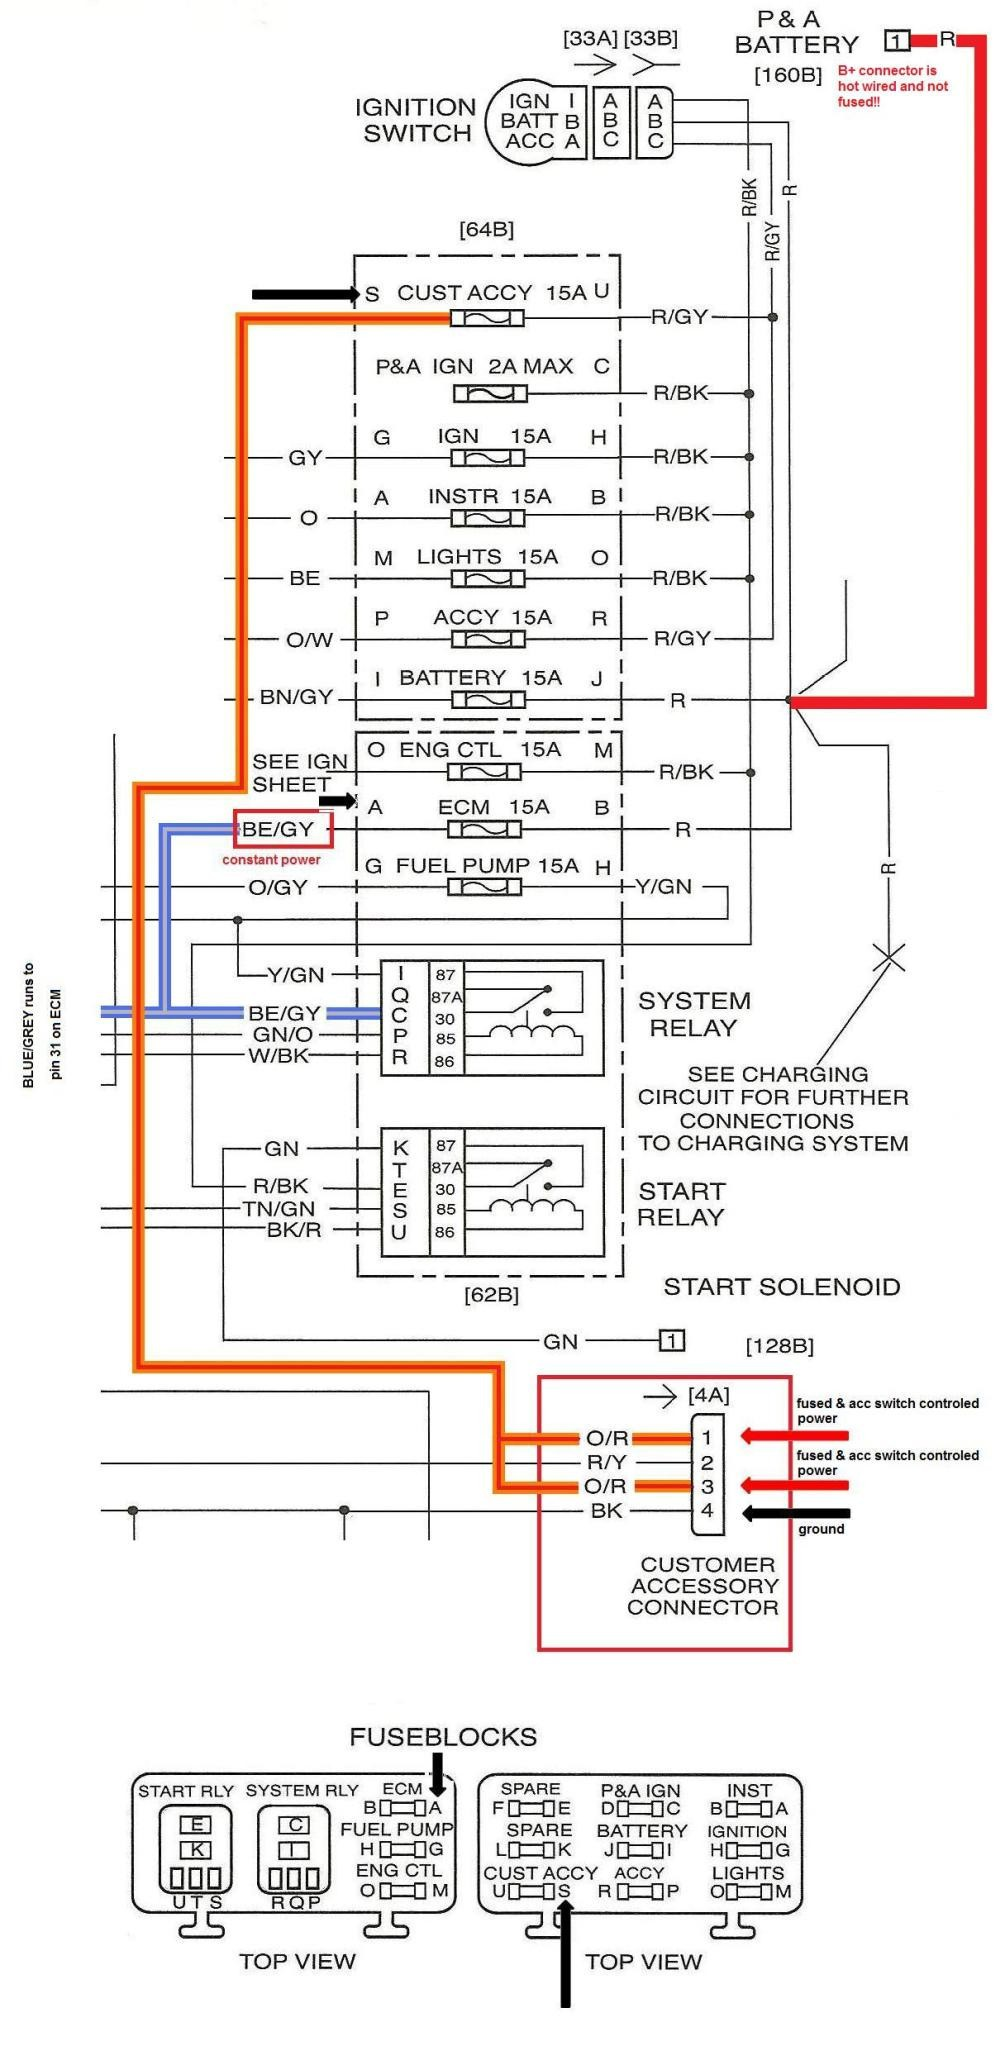 Harley Davidson Radio Wiring Diagram Harley Davidson Radio Wiring Diagram Valid Sample Pdf Harley Of Harley Davidson Radio Wiring Diagram